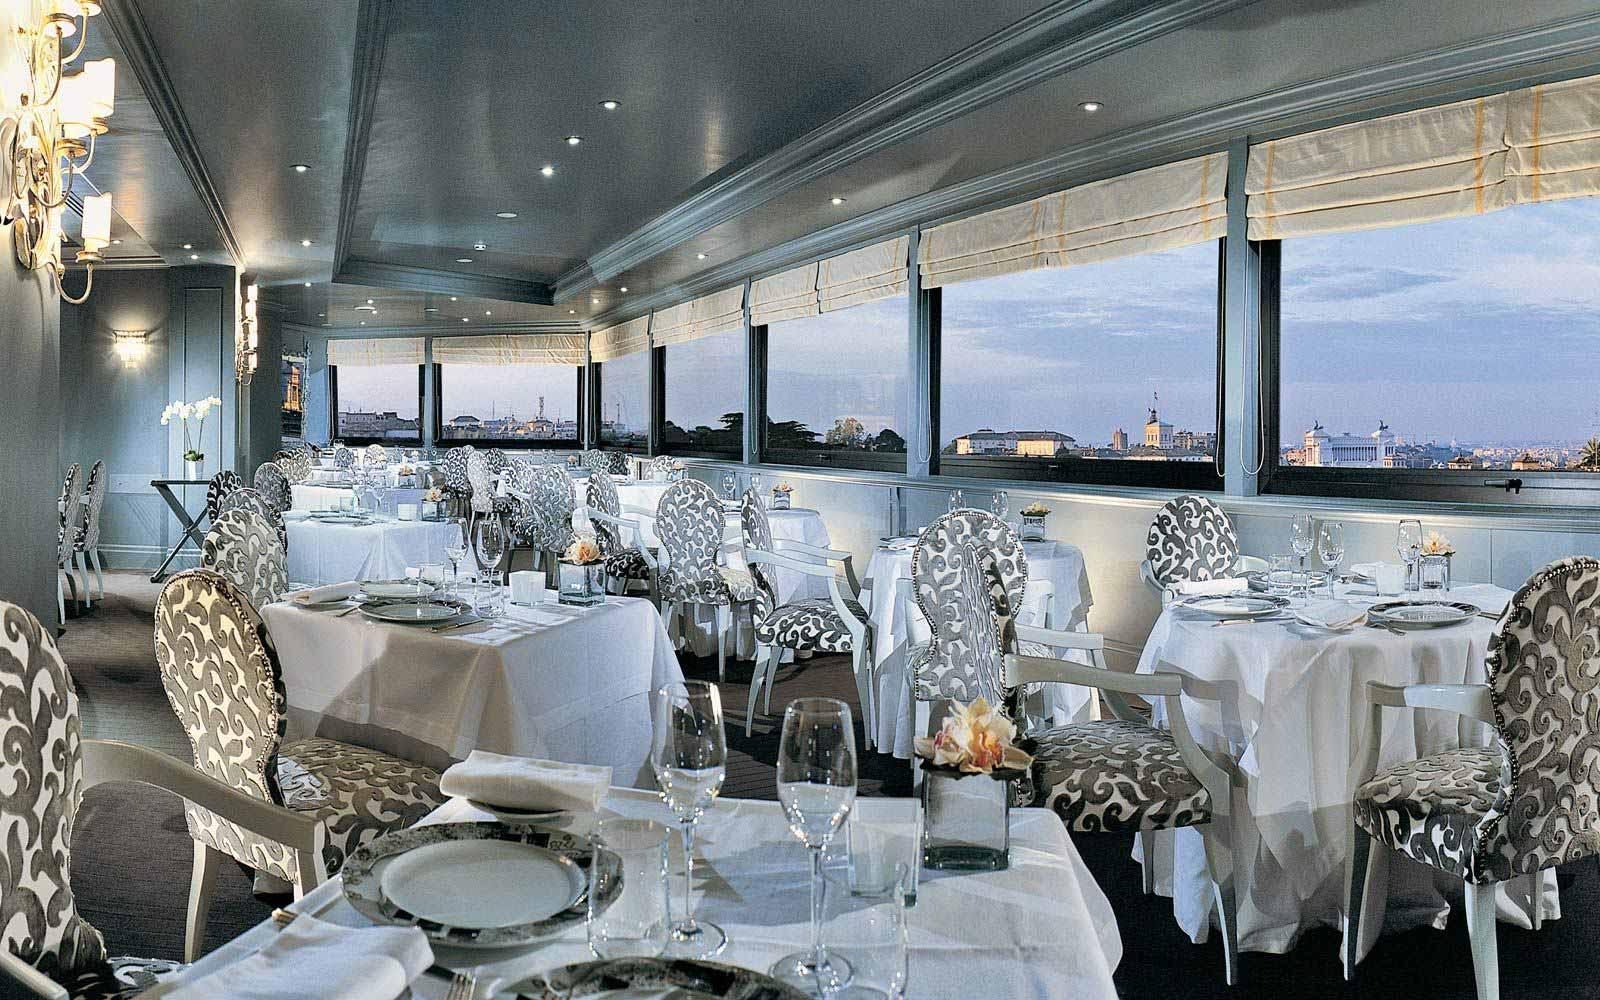 La Terrazza restaurant at Hotel Eden